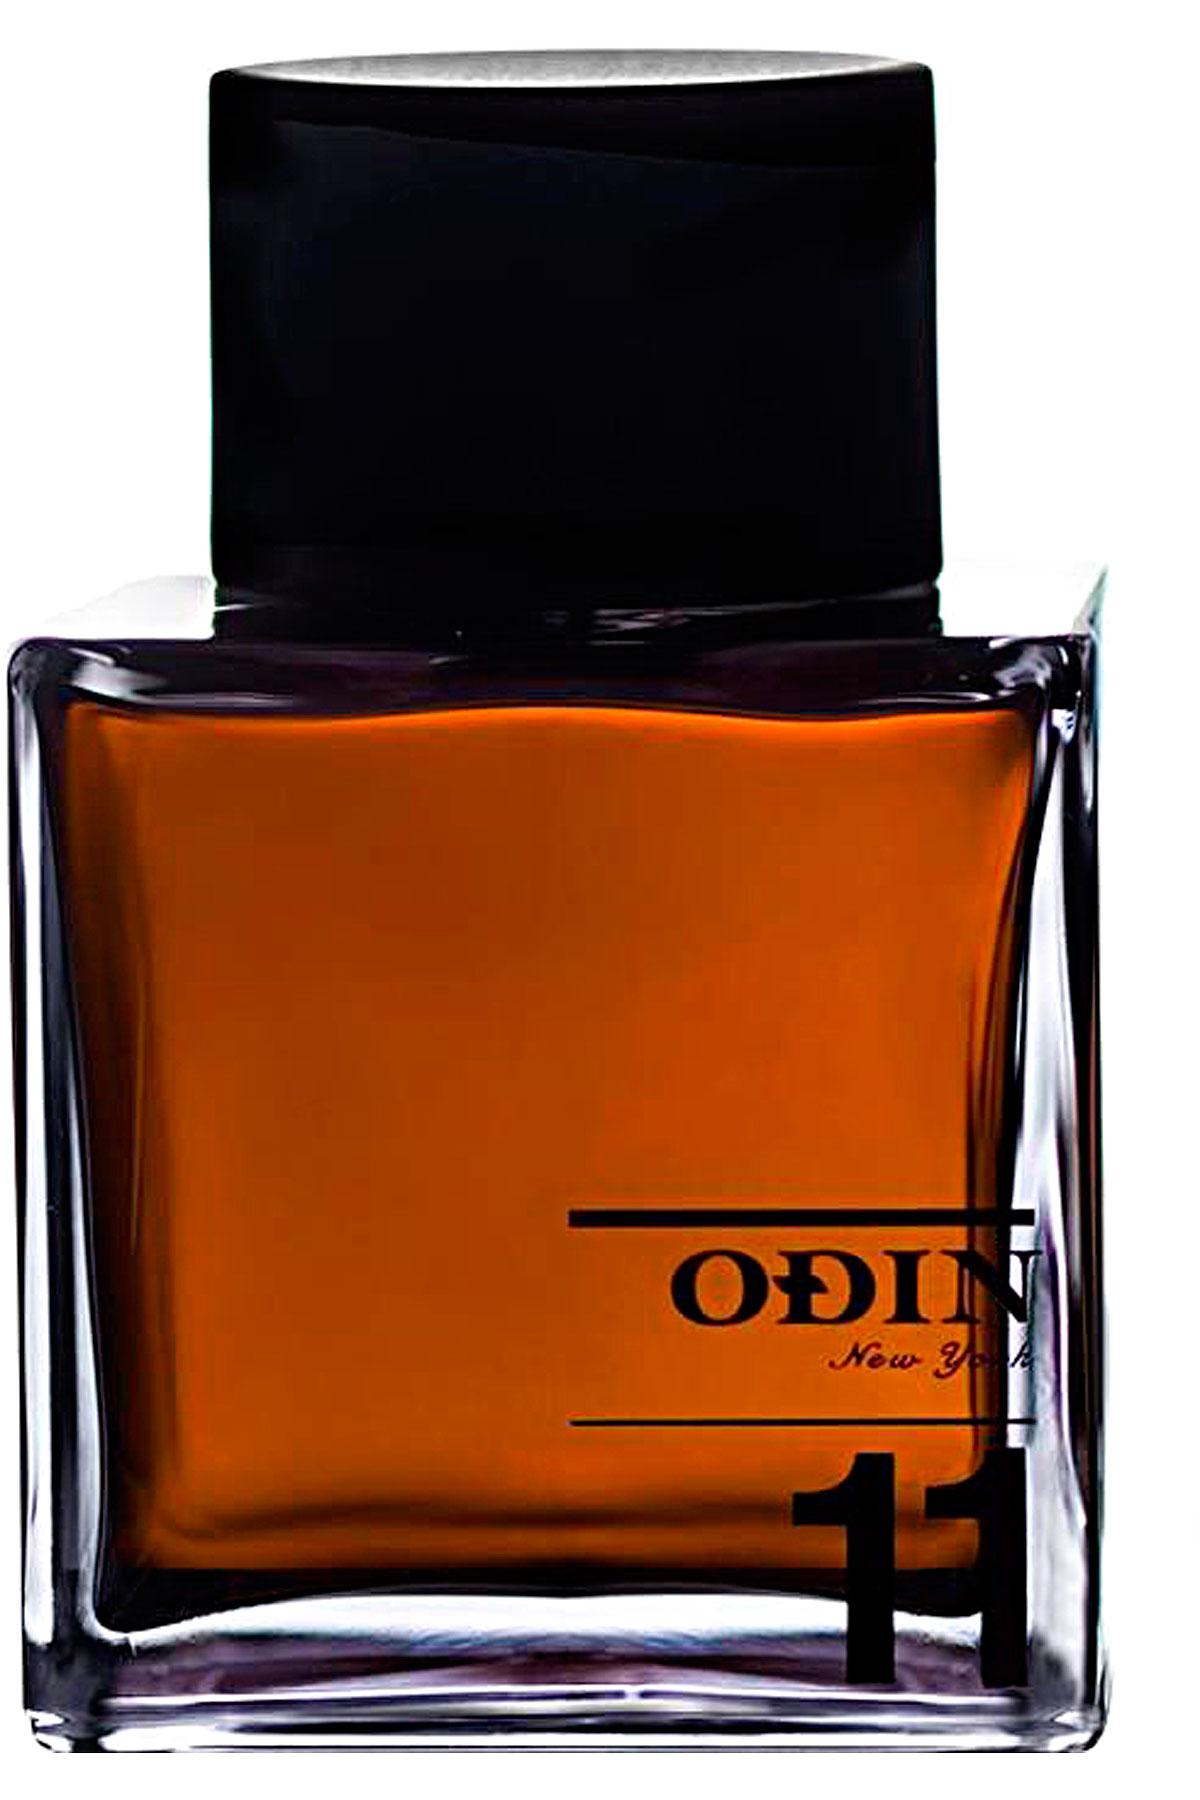 Odin New York Fragrances for Women On Sale, 11 Semma - Eau De Parfum - 100 Ml, 2019, 100 ml